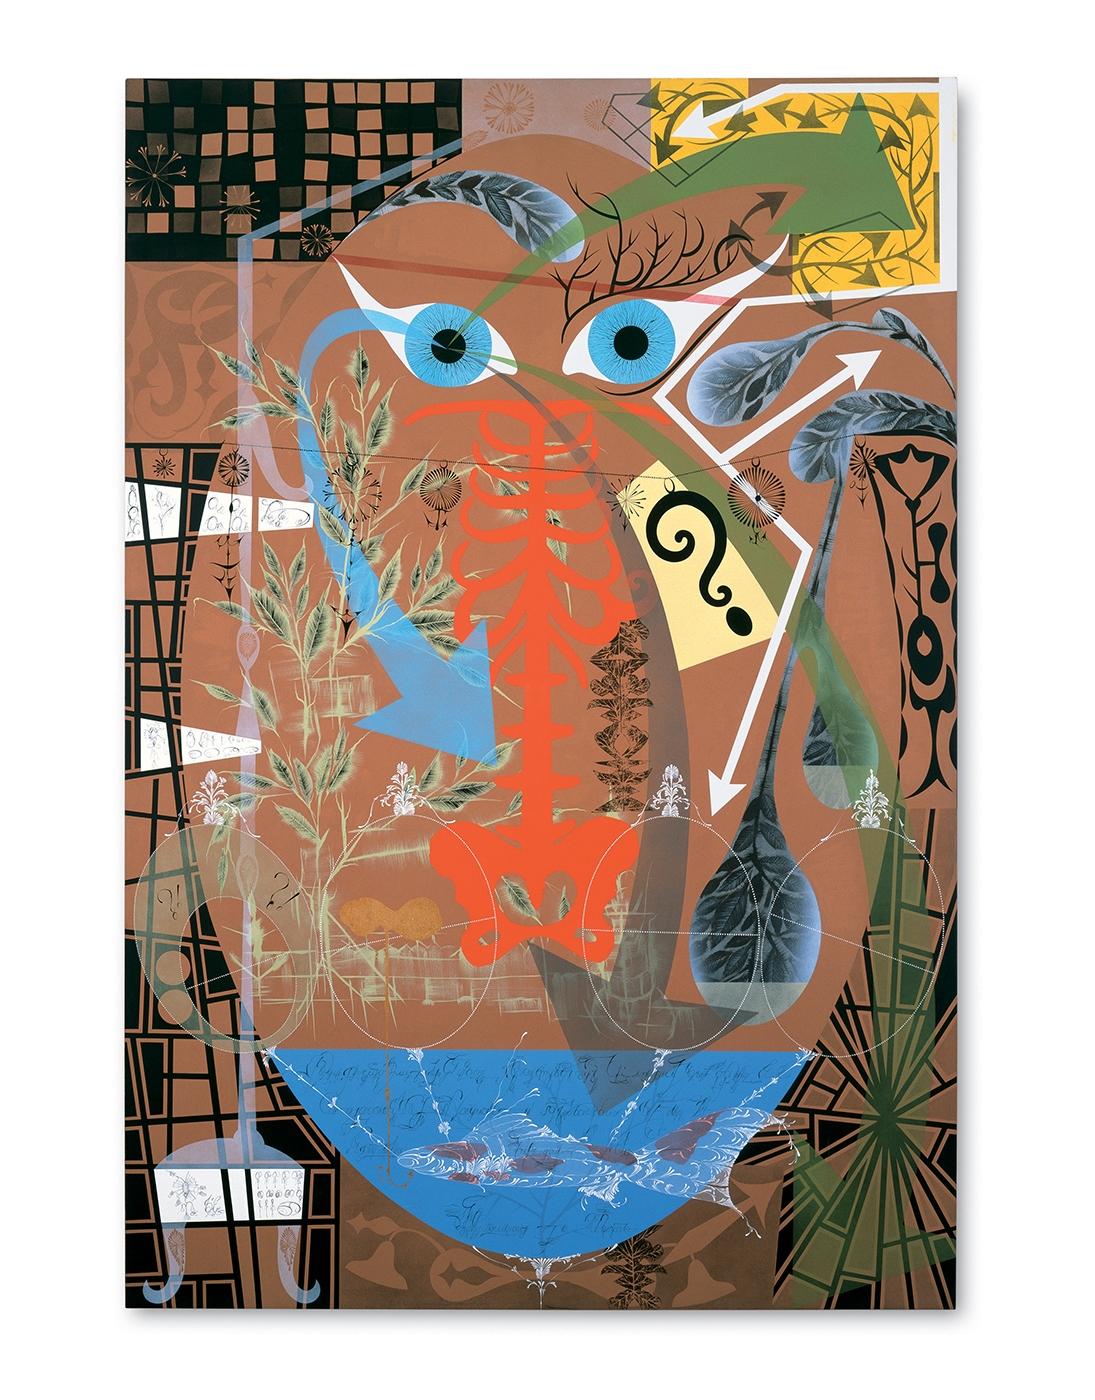 LARI PITTMAN, The Senseless Cycles, Tender and Benign, Bring Great Comfort, 1988